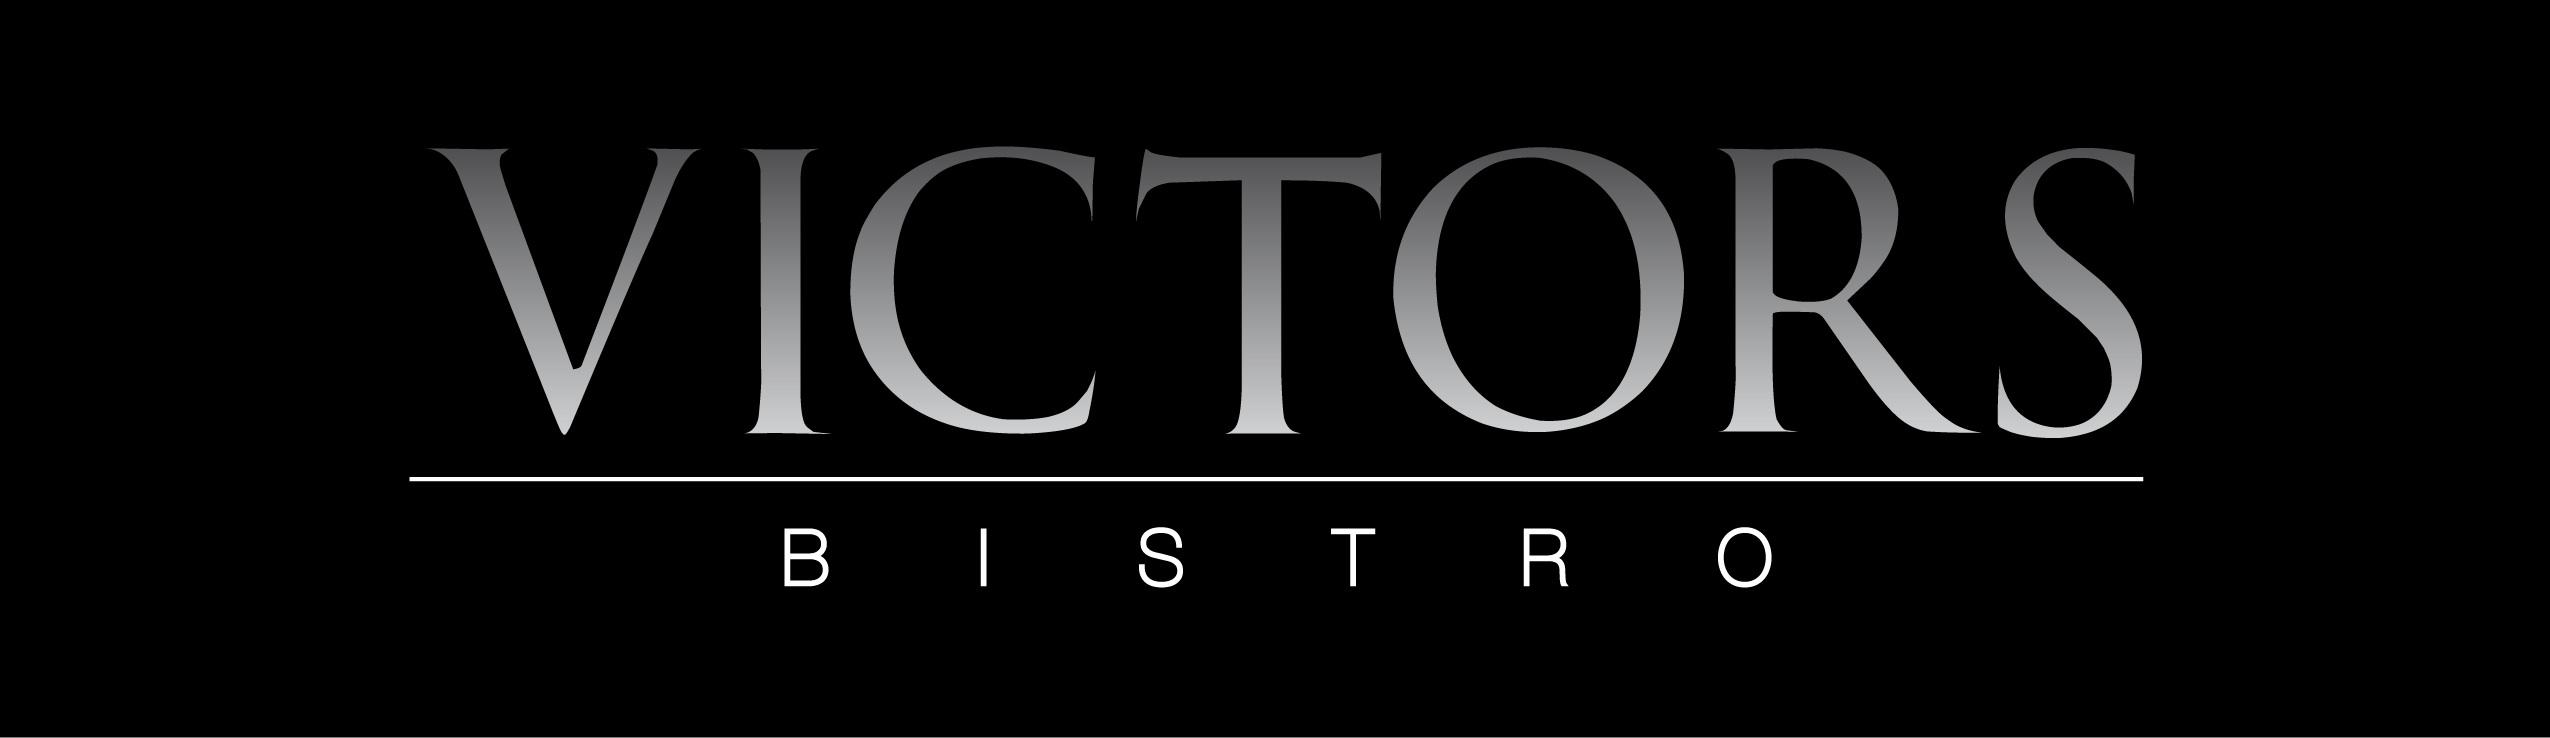 Victor's Bistro